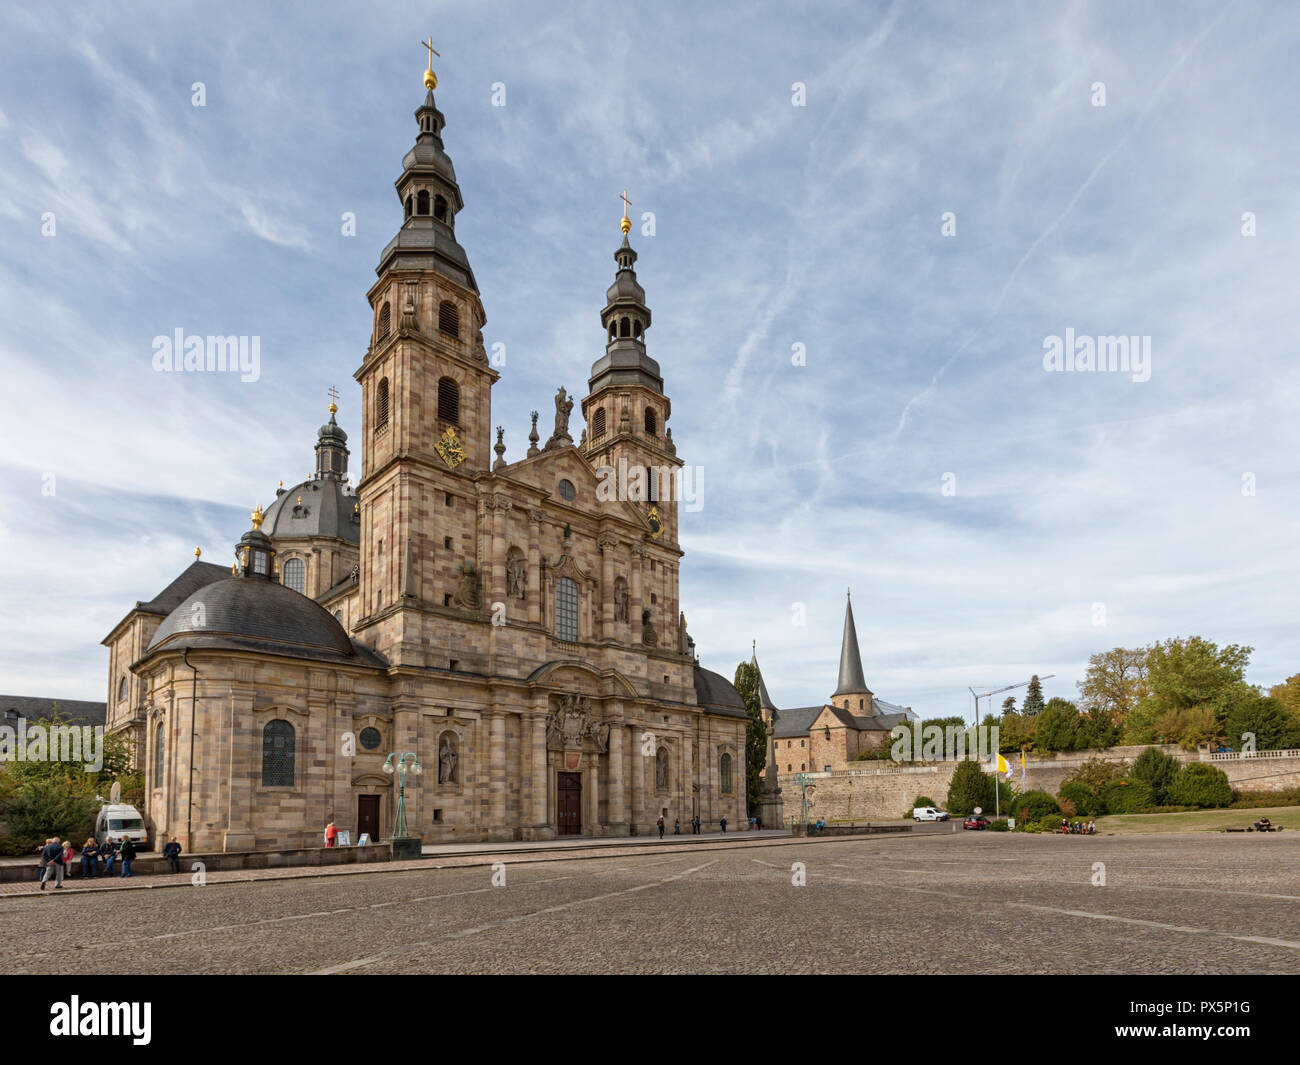 Fuldaer Dom am Domplatz, Hessen, Deutschland Stockbild